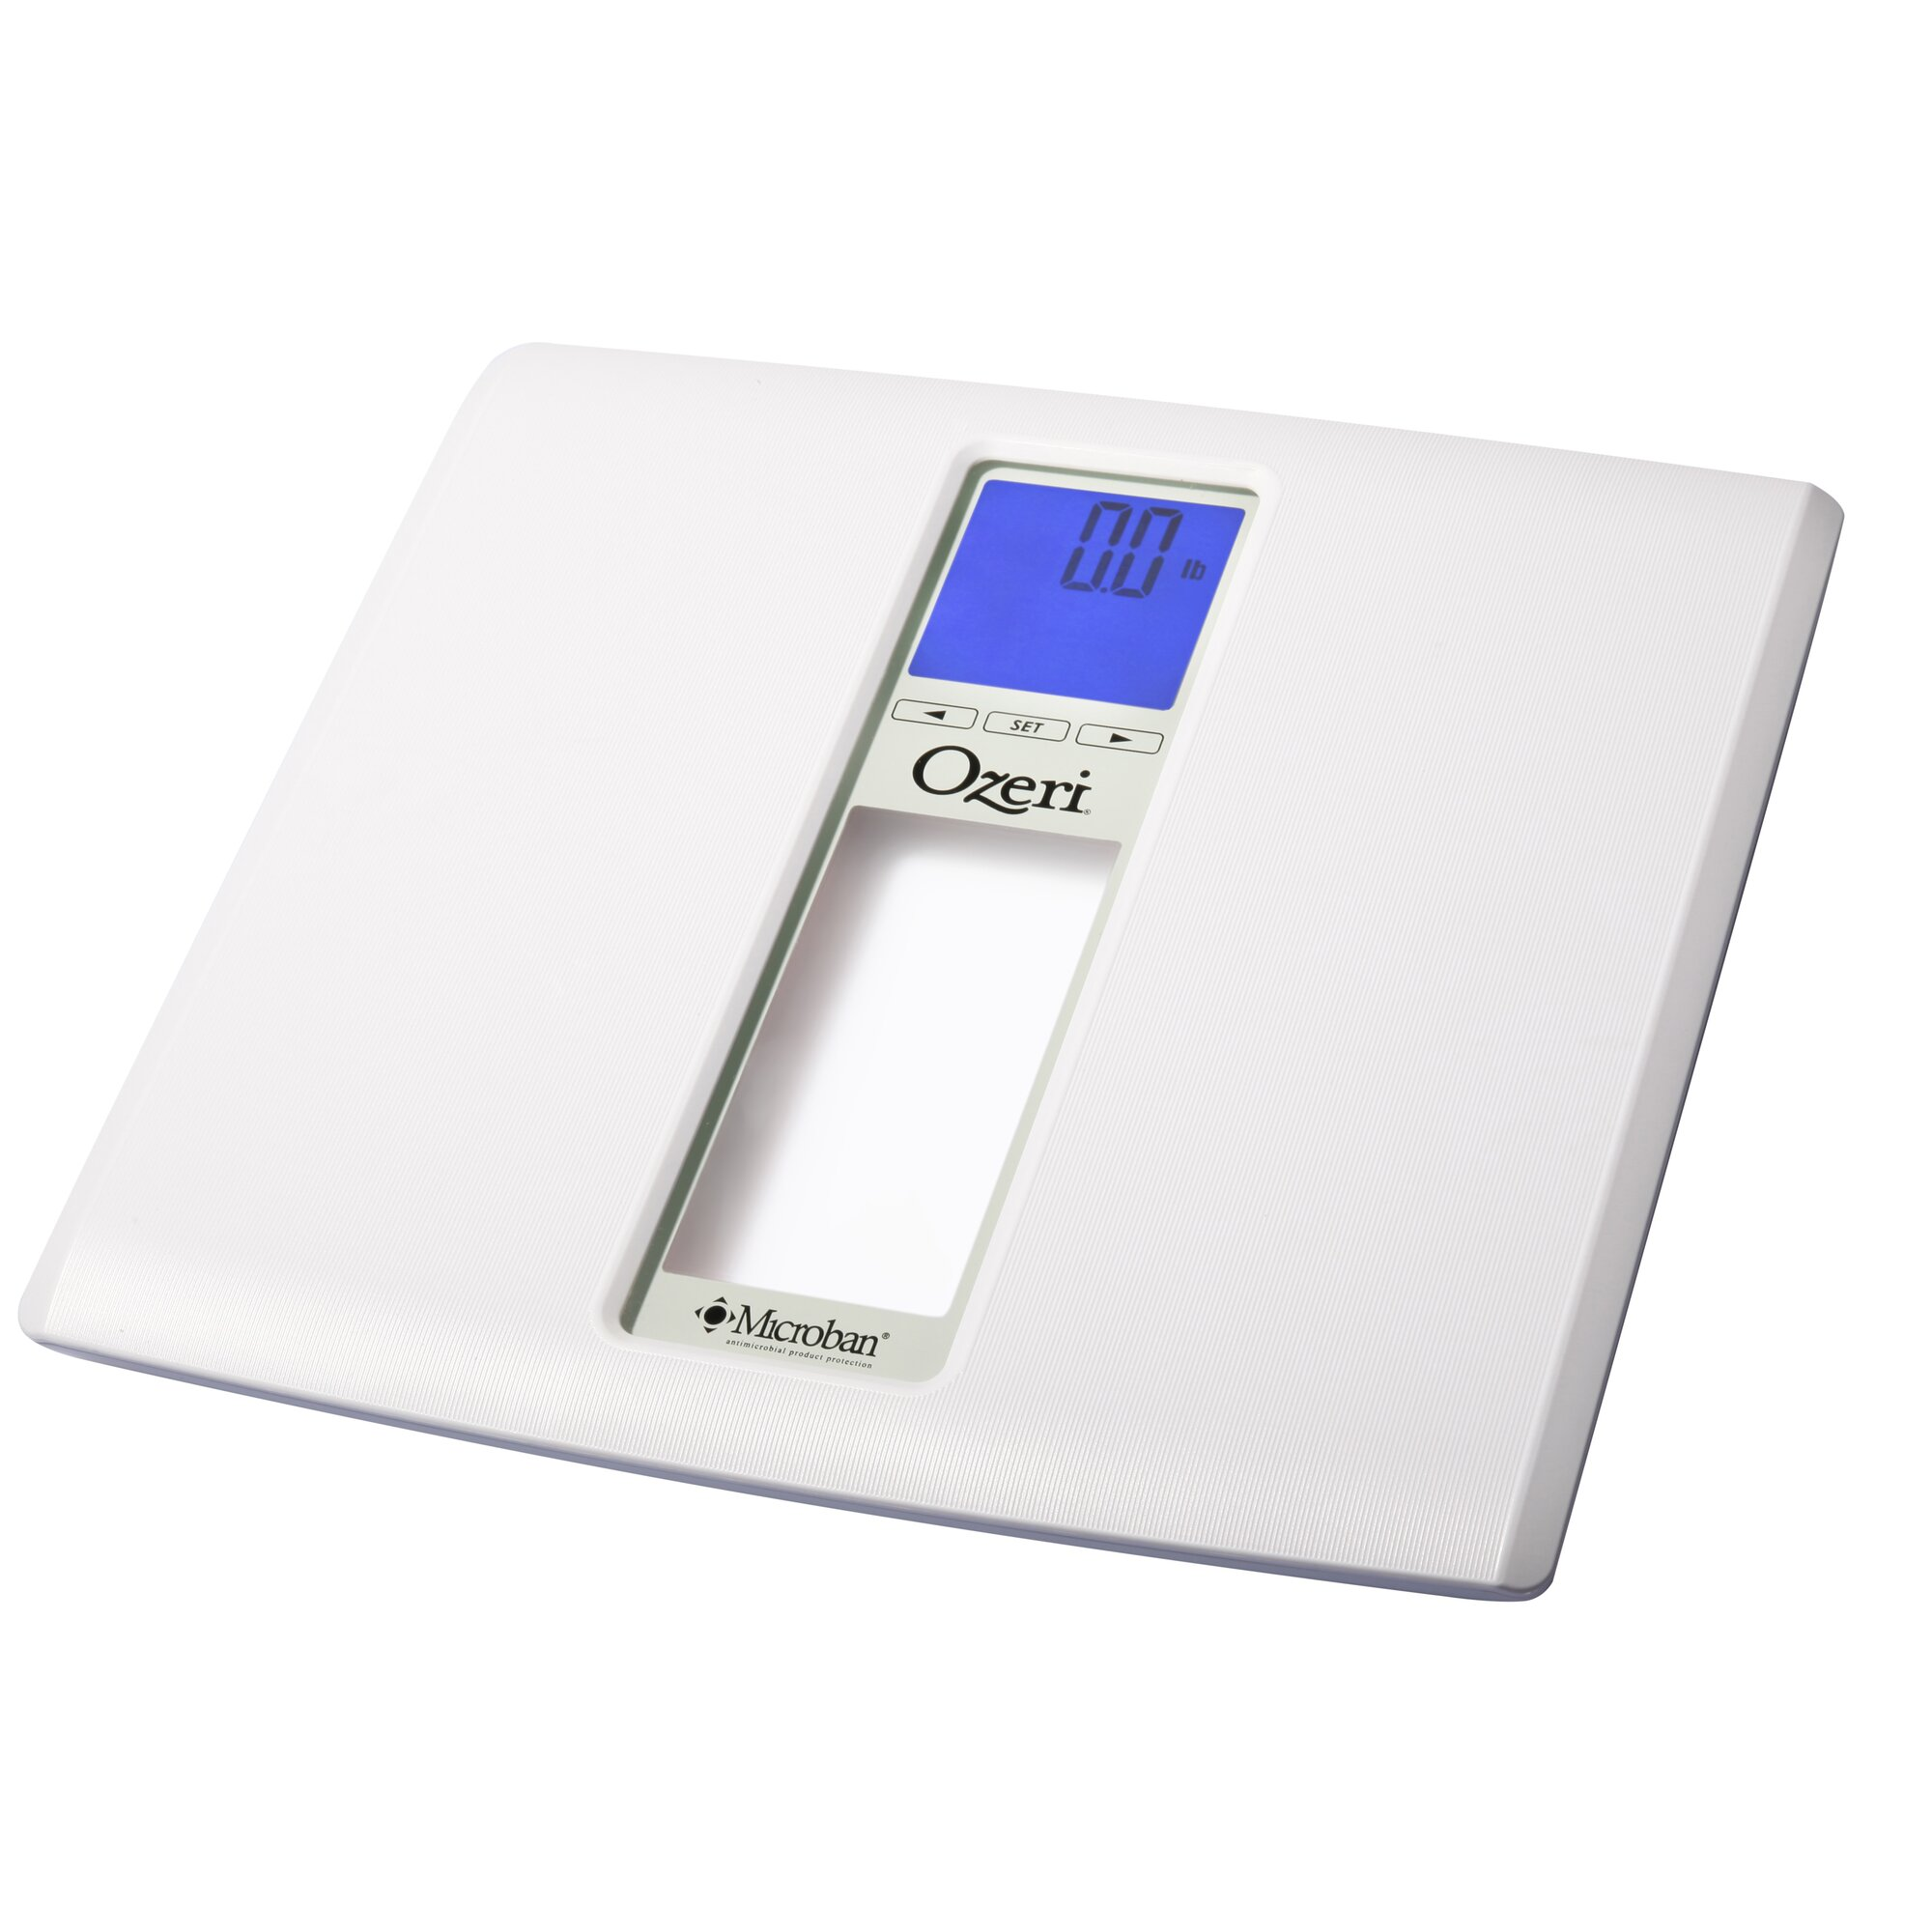 Product spotlight meet the eatsmart precision digital bathroom scale - Eatsmart Precision Digital Bathroom Scale Manual Weightmaster Ii 440 Lbs Digital Bath Scale With Bmi